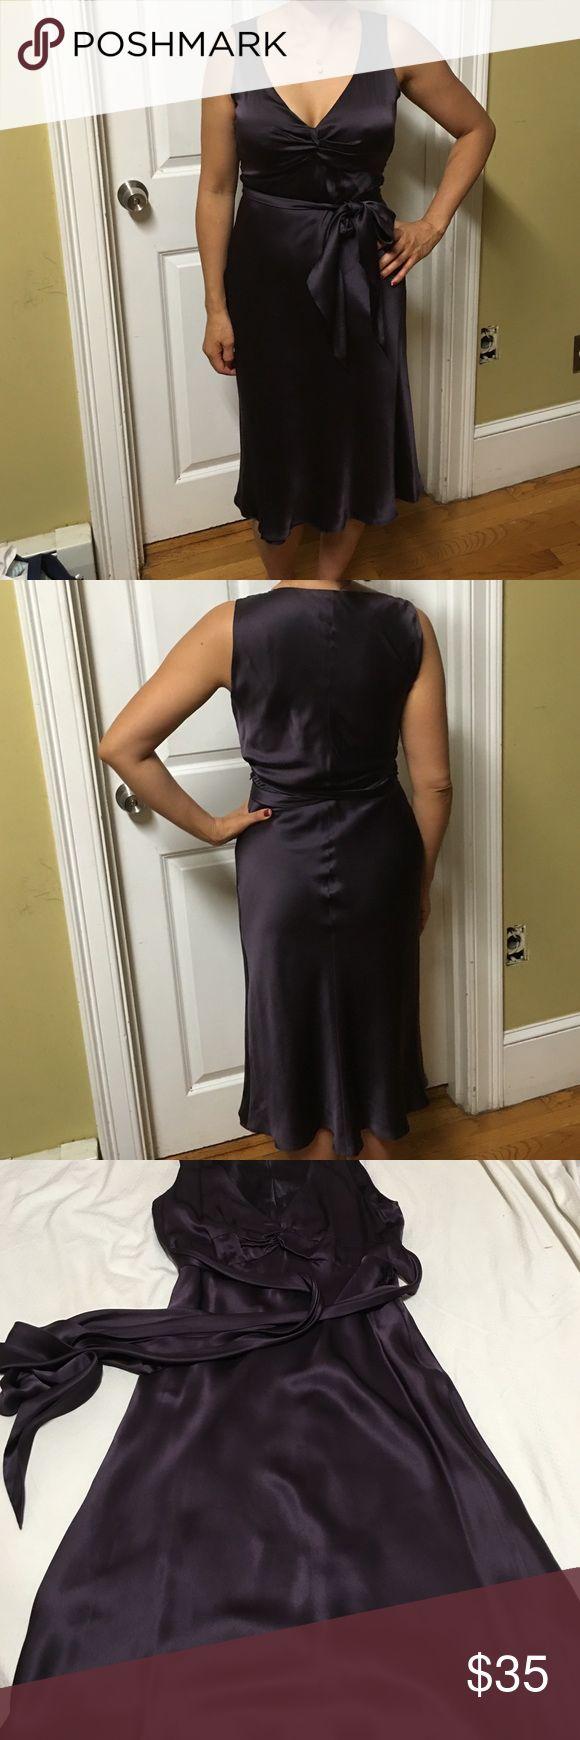 Laundry by shelli segal dresses 100% silk. Good condition Laundry by Shelli Segal Dresses Midi